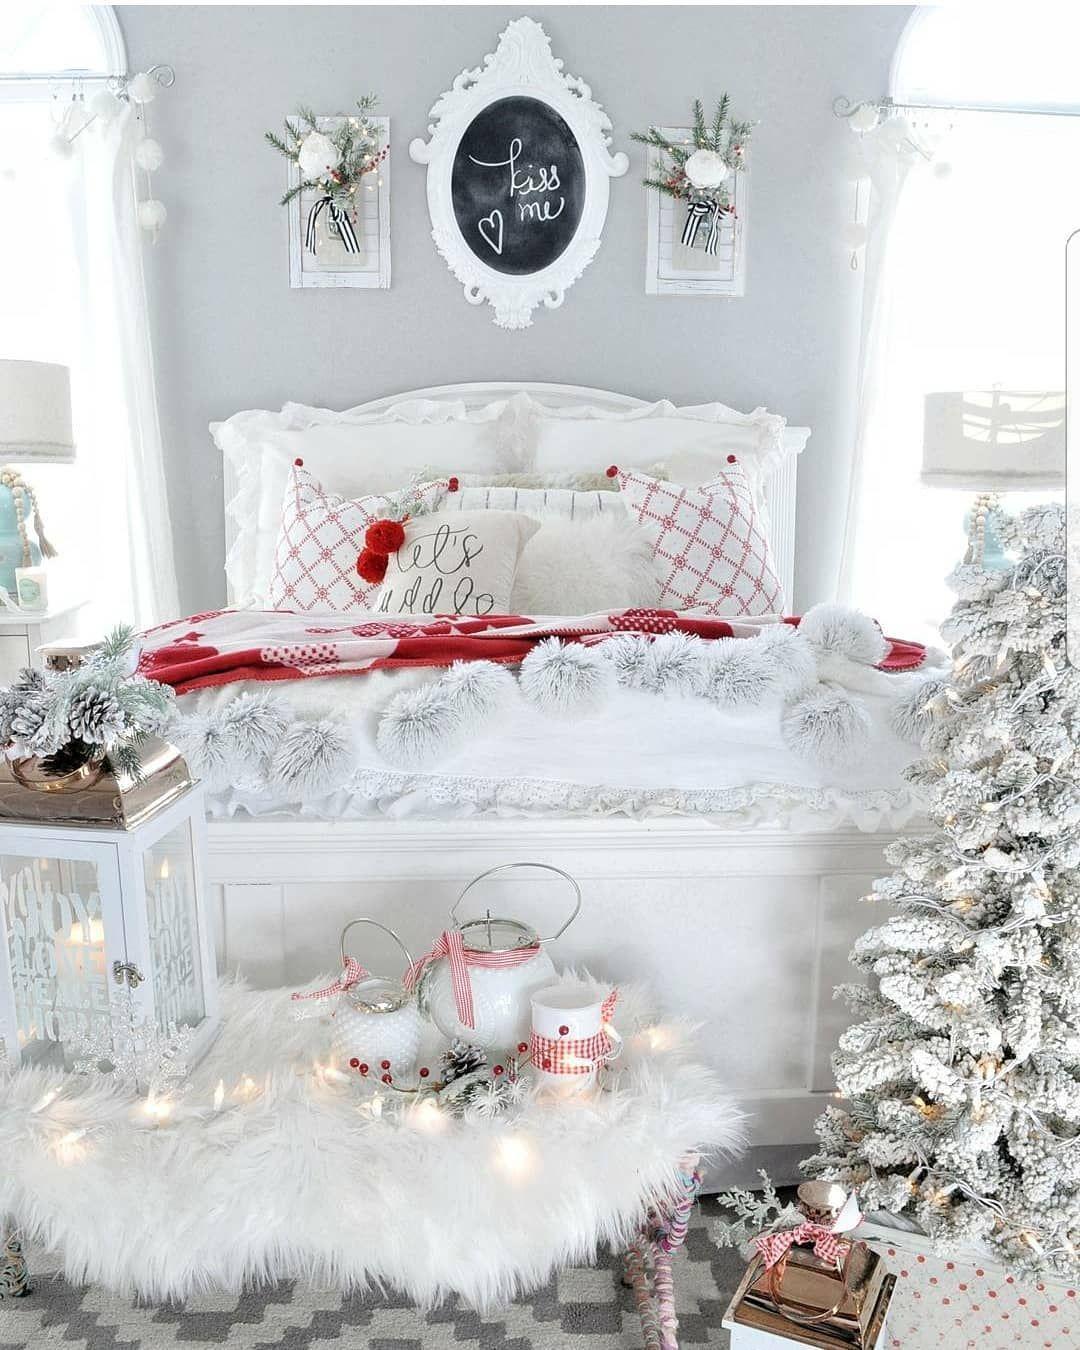 Christmas decor for room